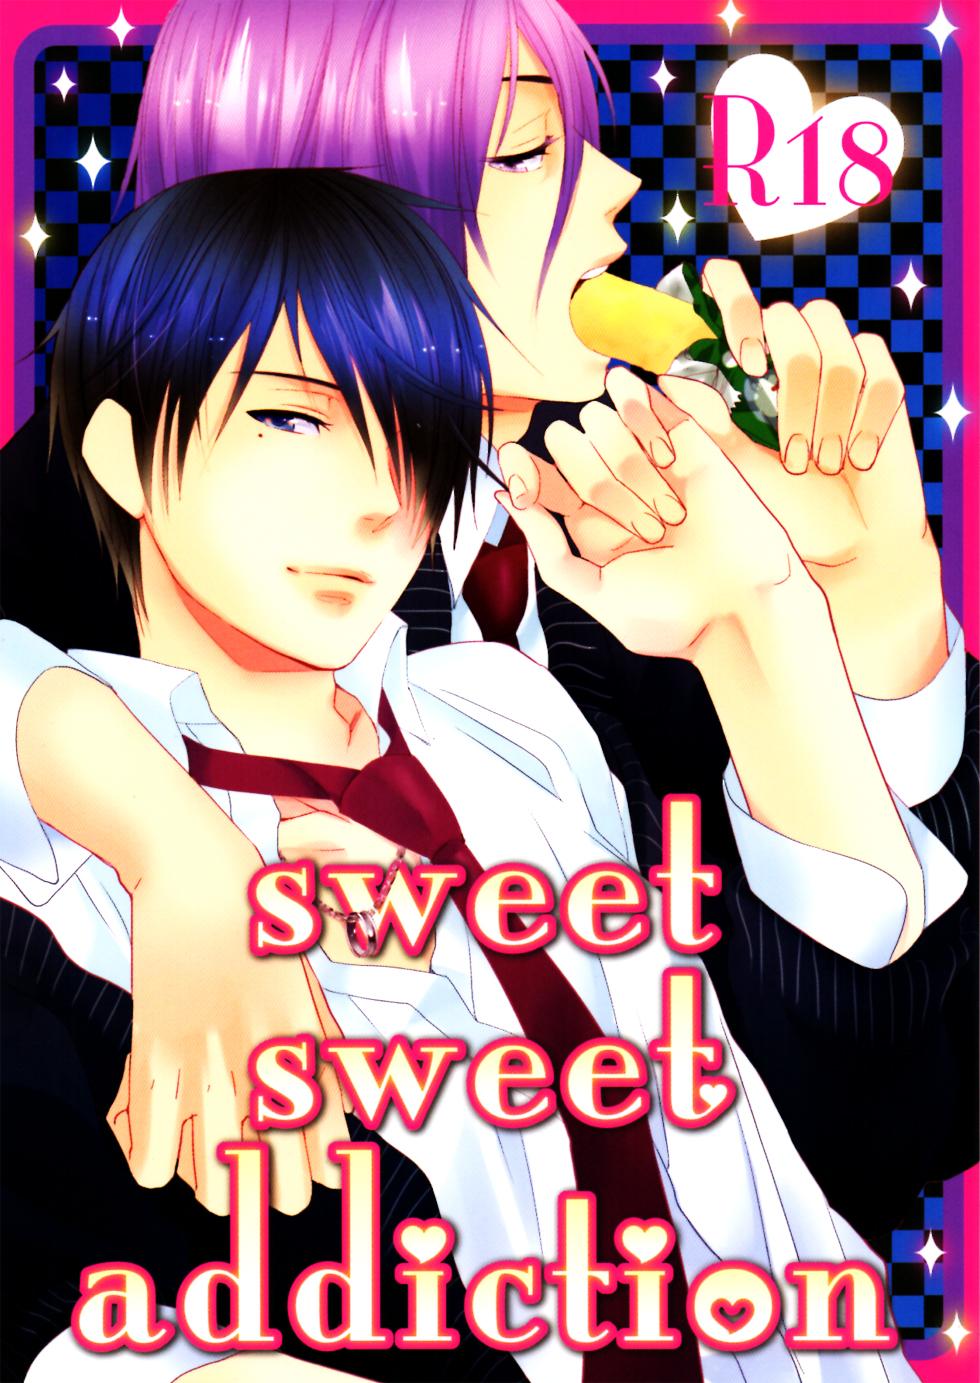 Kuroko no Basket dj - Sweet sweet addiction